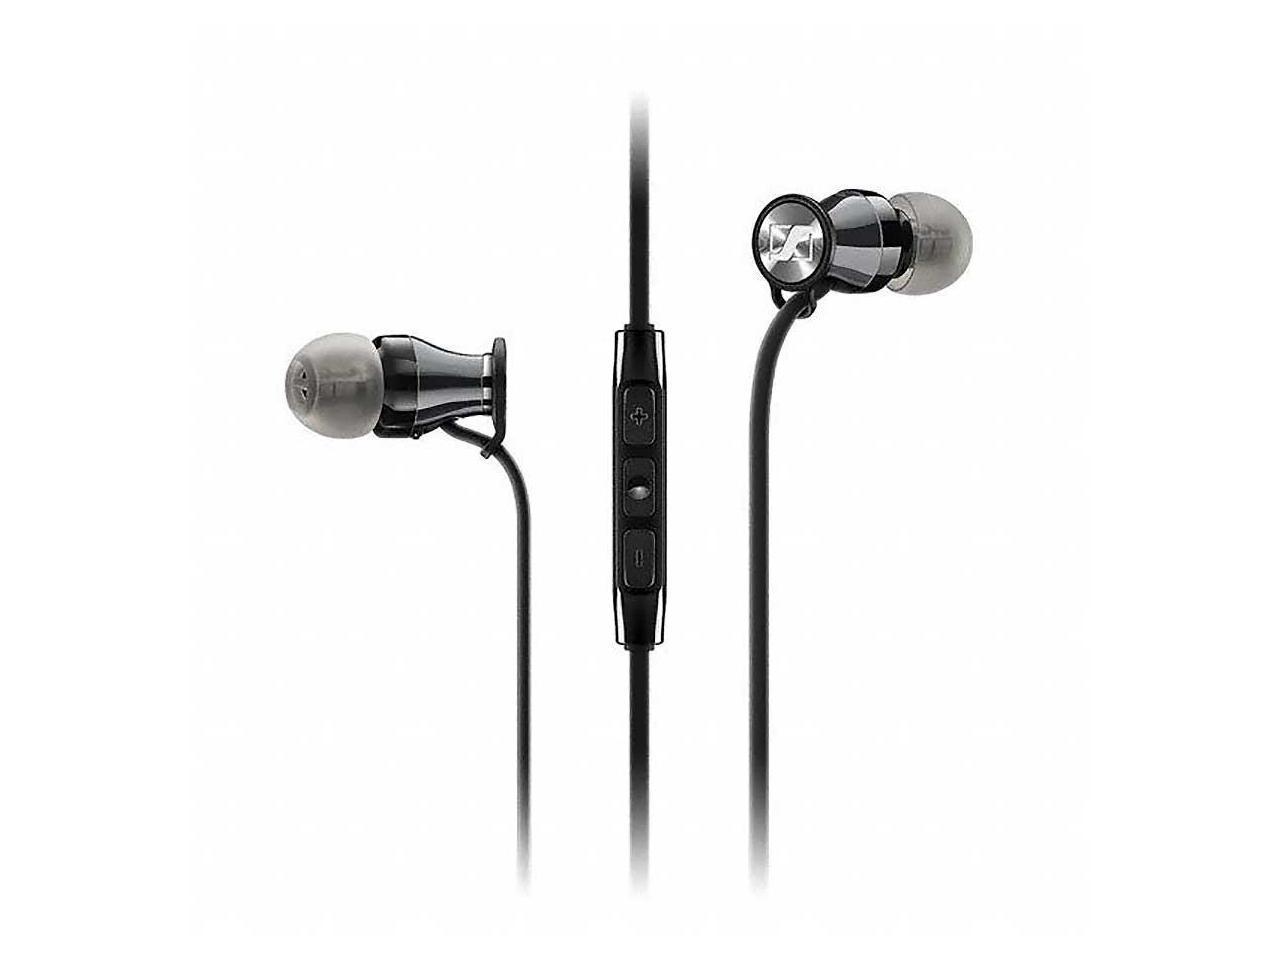 Sennheiser M2 IEi In-Ear Headphones for iPhone, iPad, and iPod (Black/Chrome) $34.99 + Free Shipping